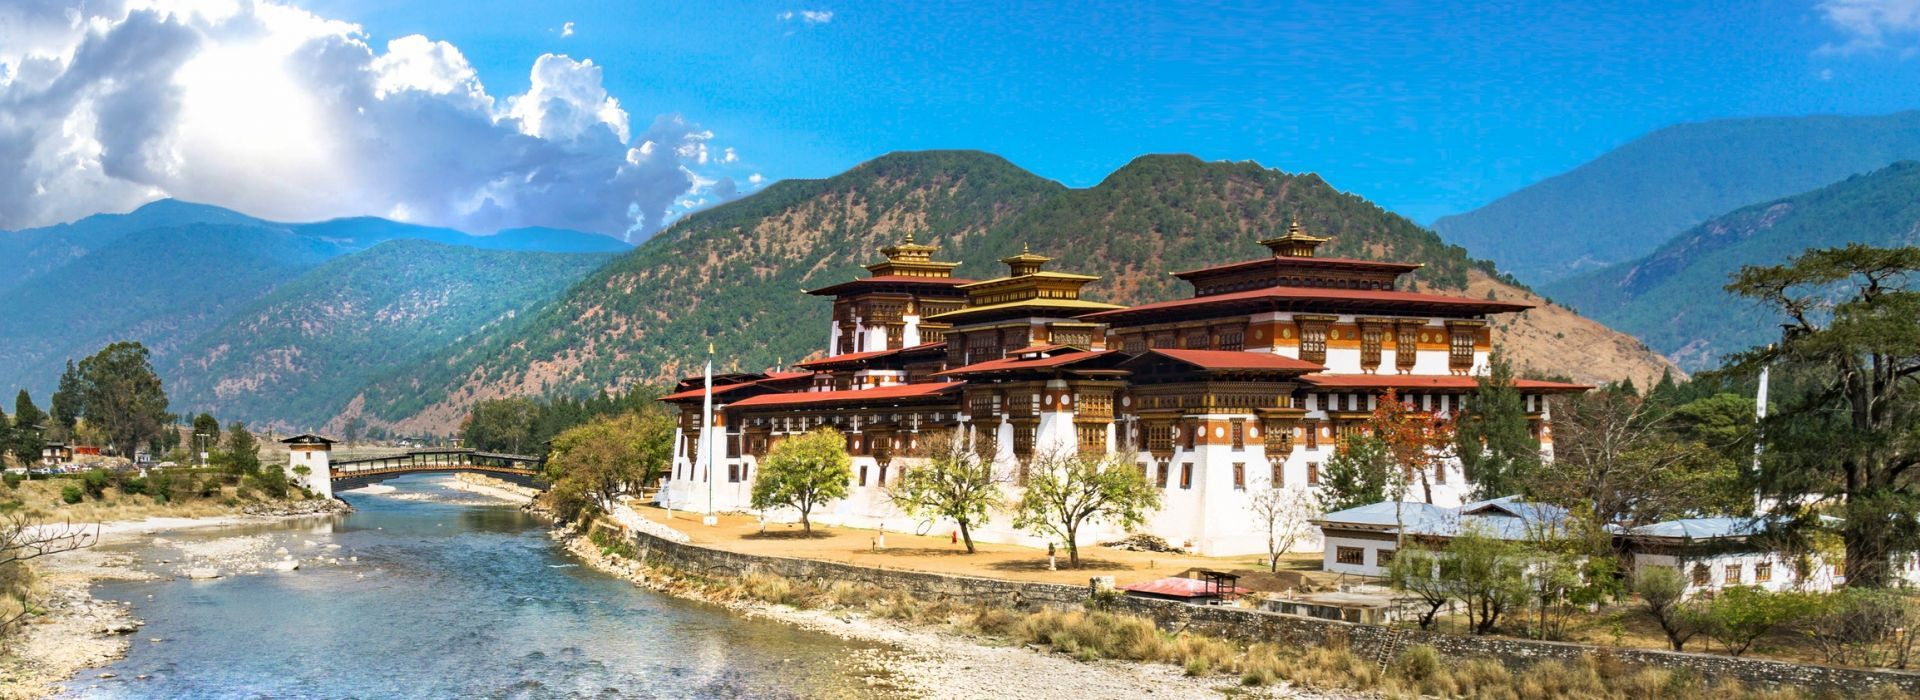 Bicycle tours in Bhutan